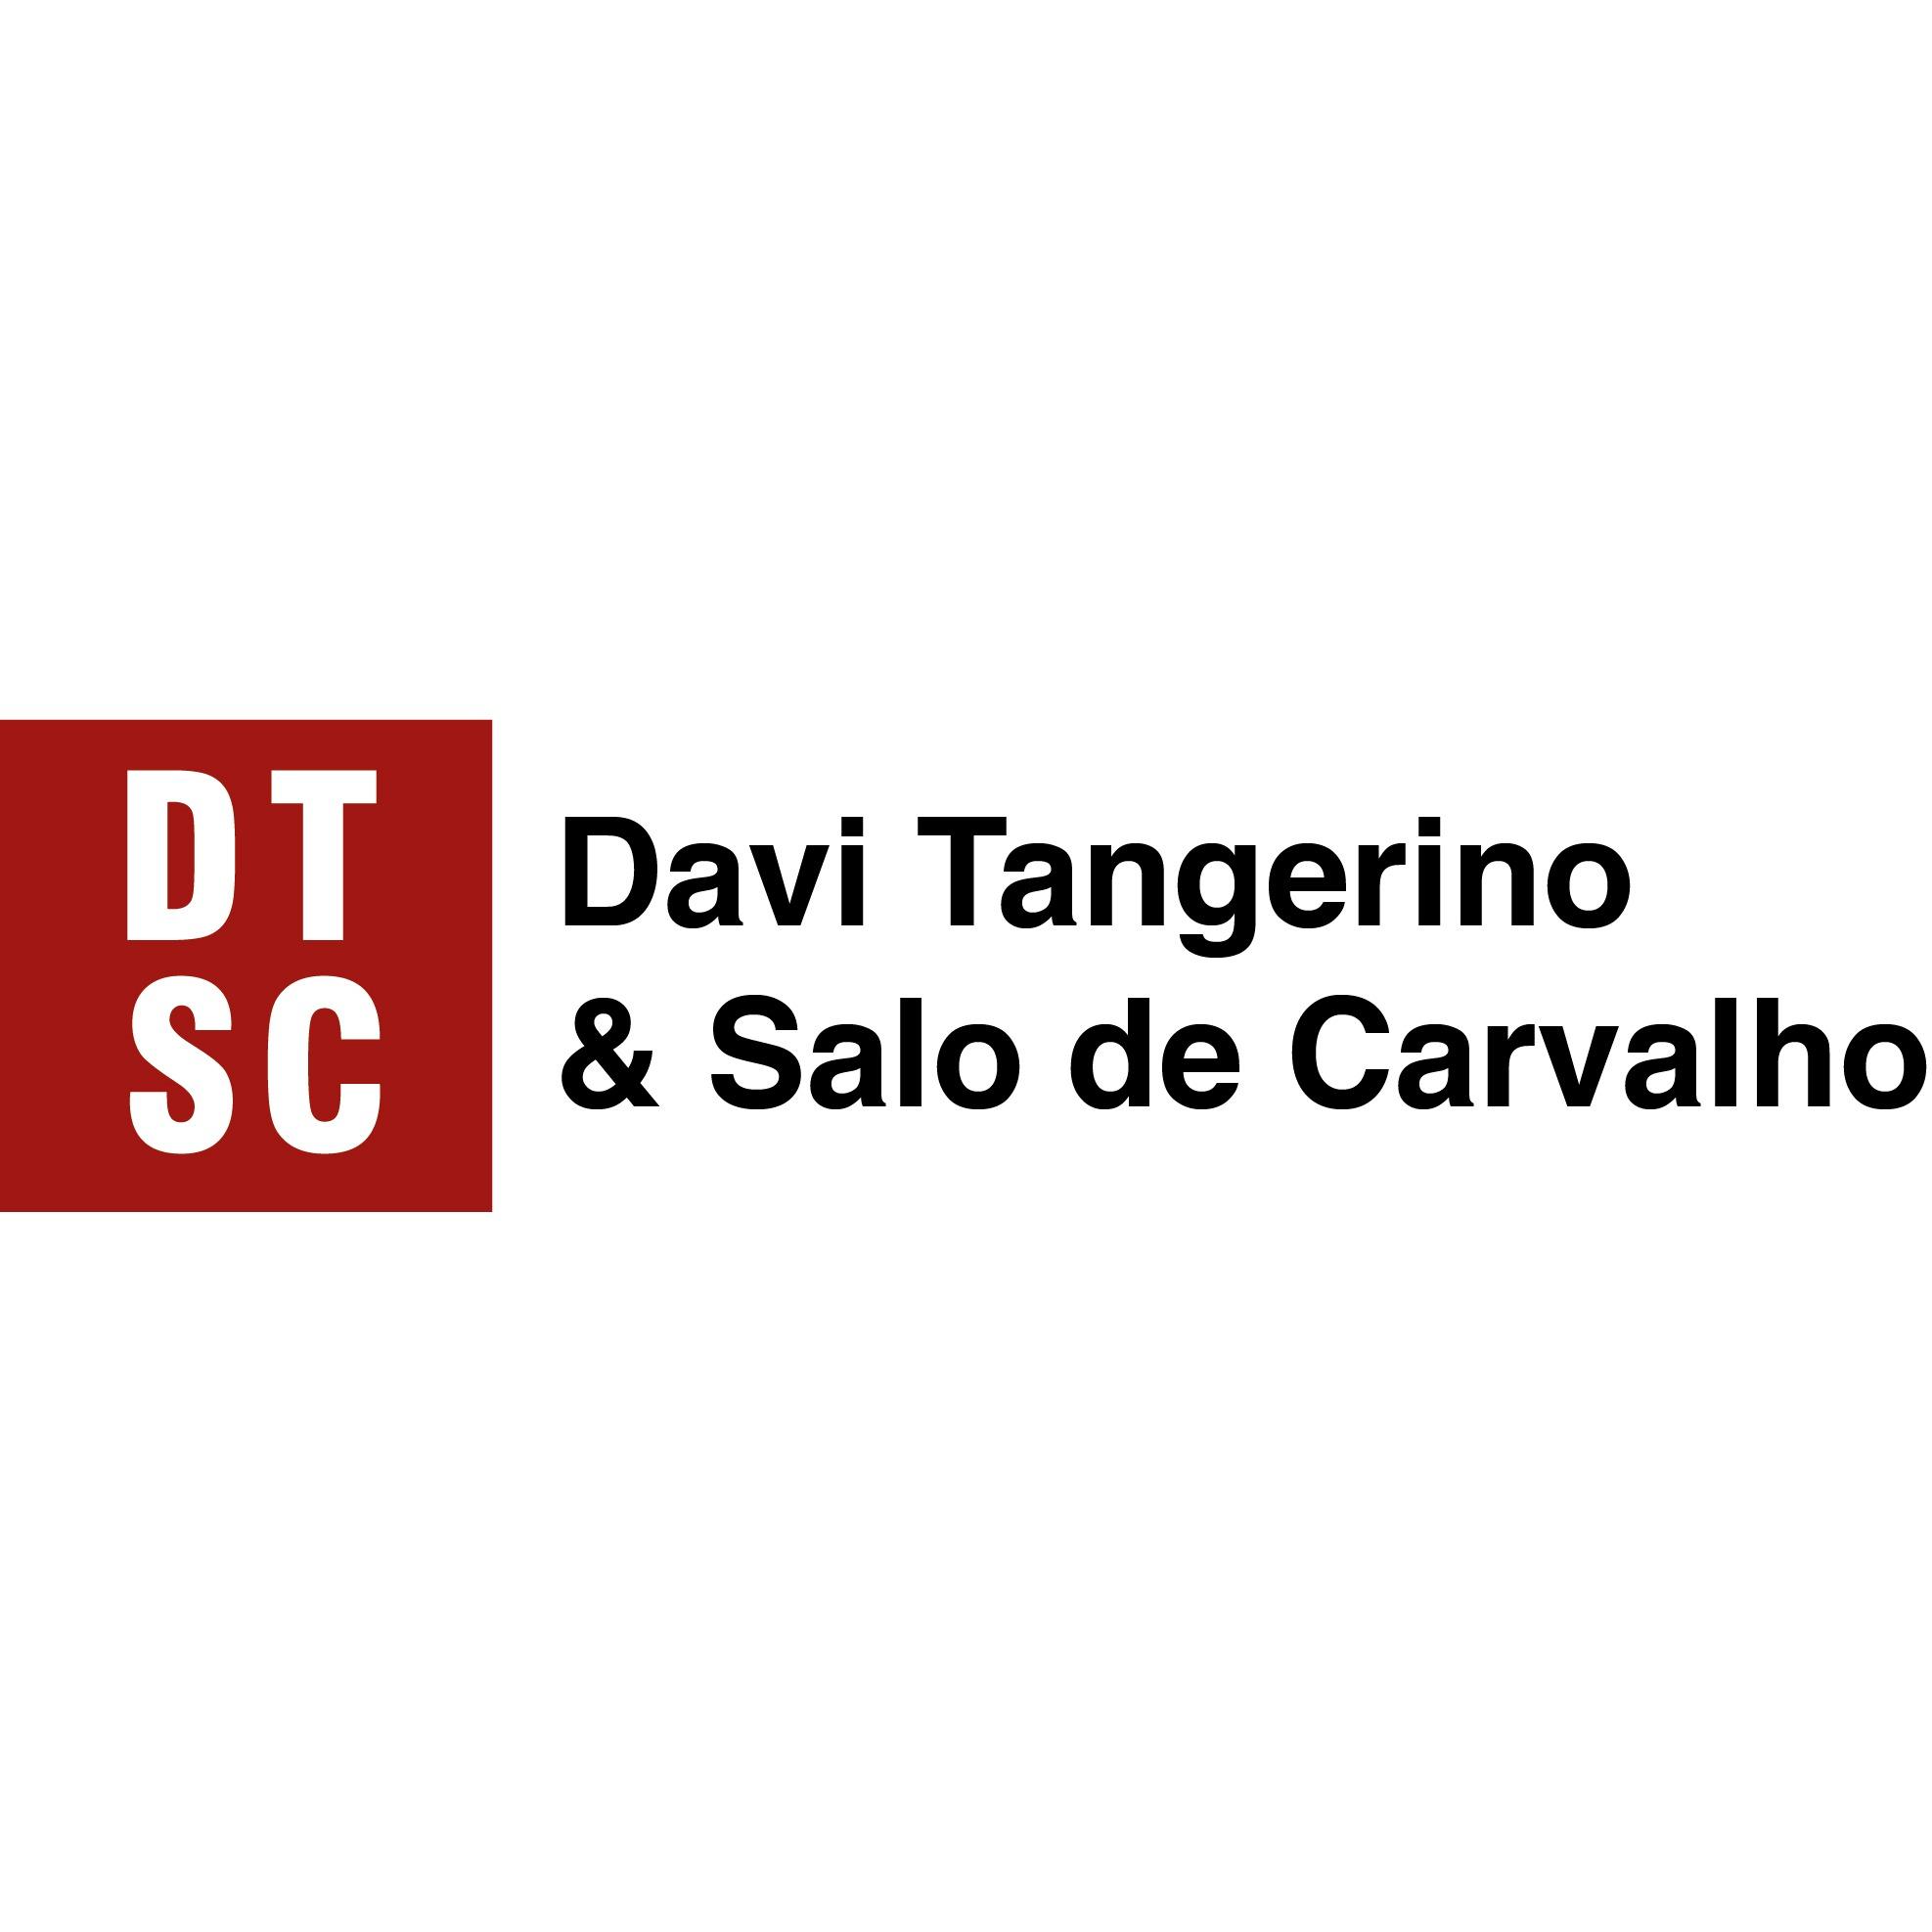 the Davi Tangerino e Salo de Carvalho Advogados logo.